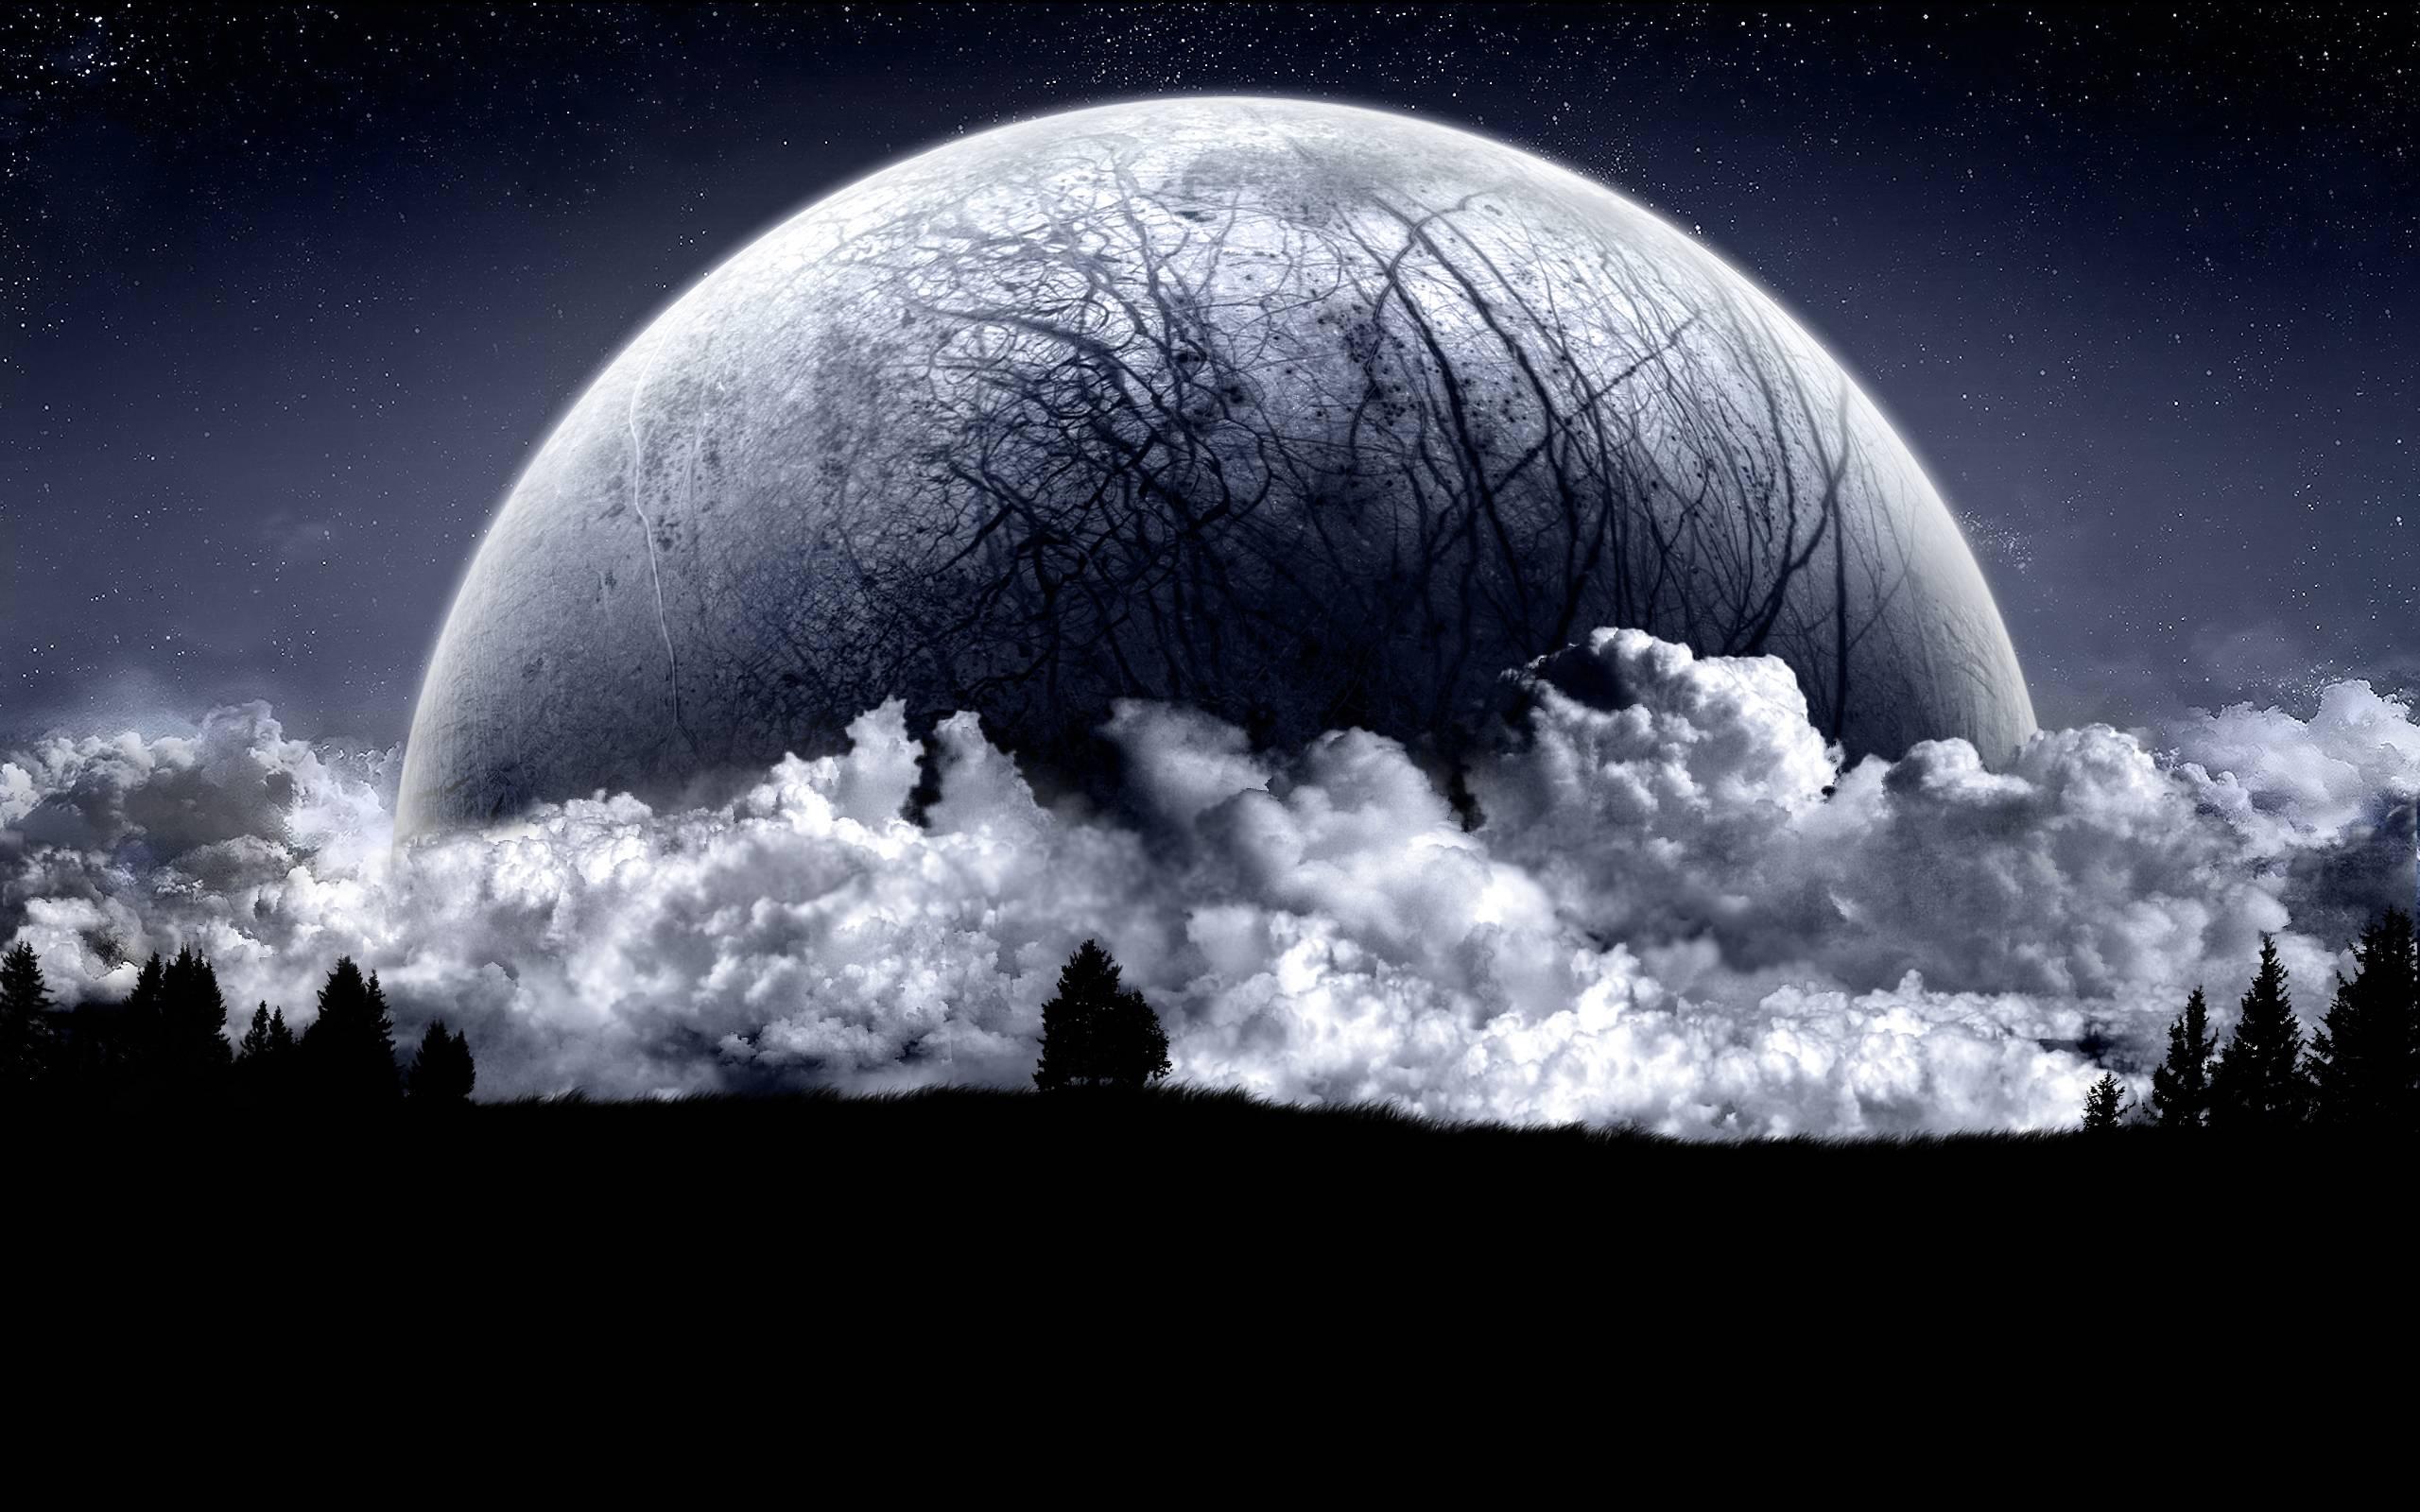 hd full moon wallpaper - photo #16